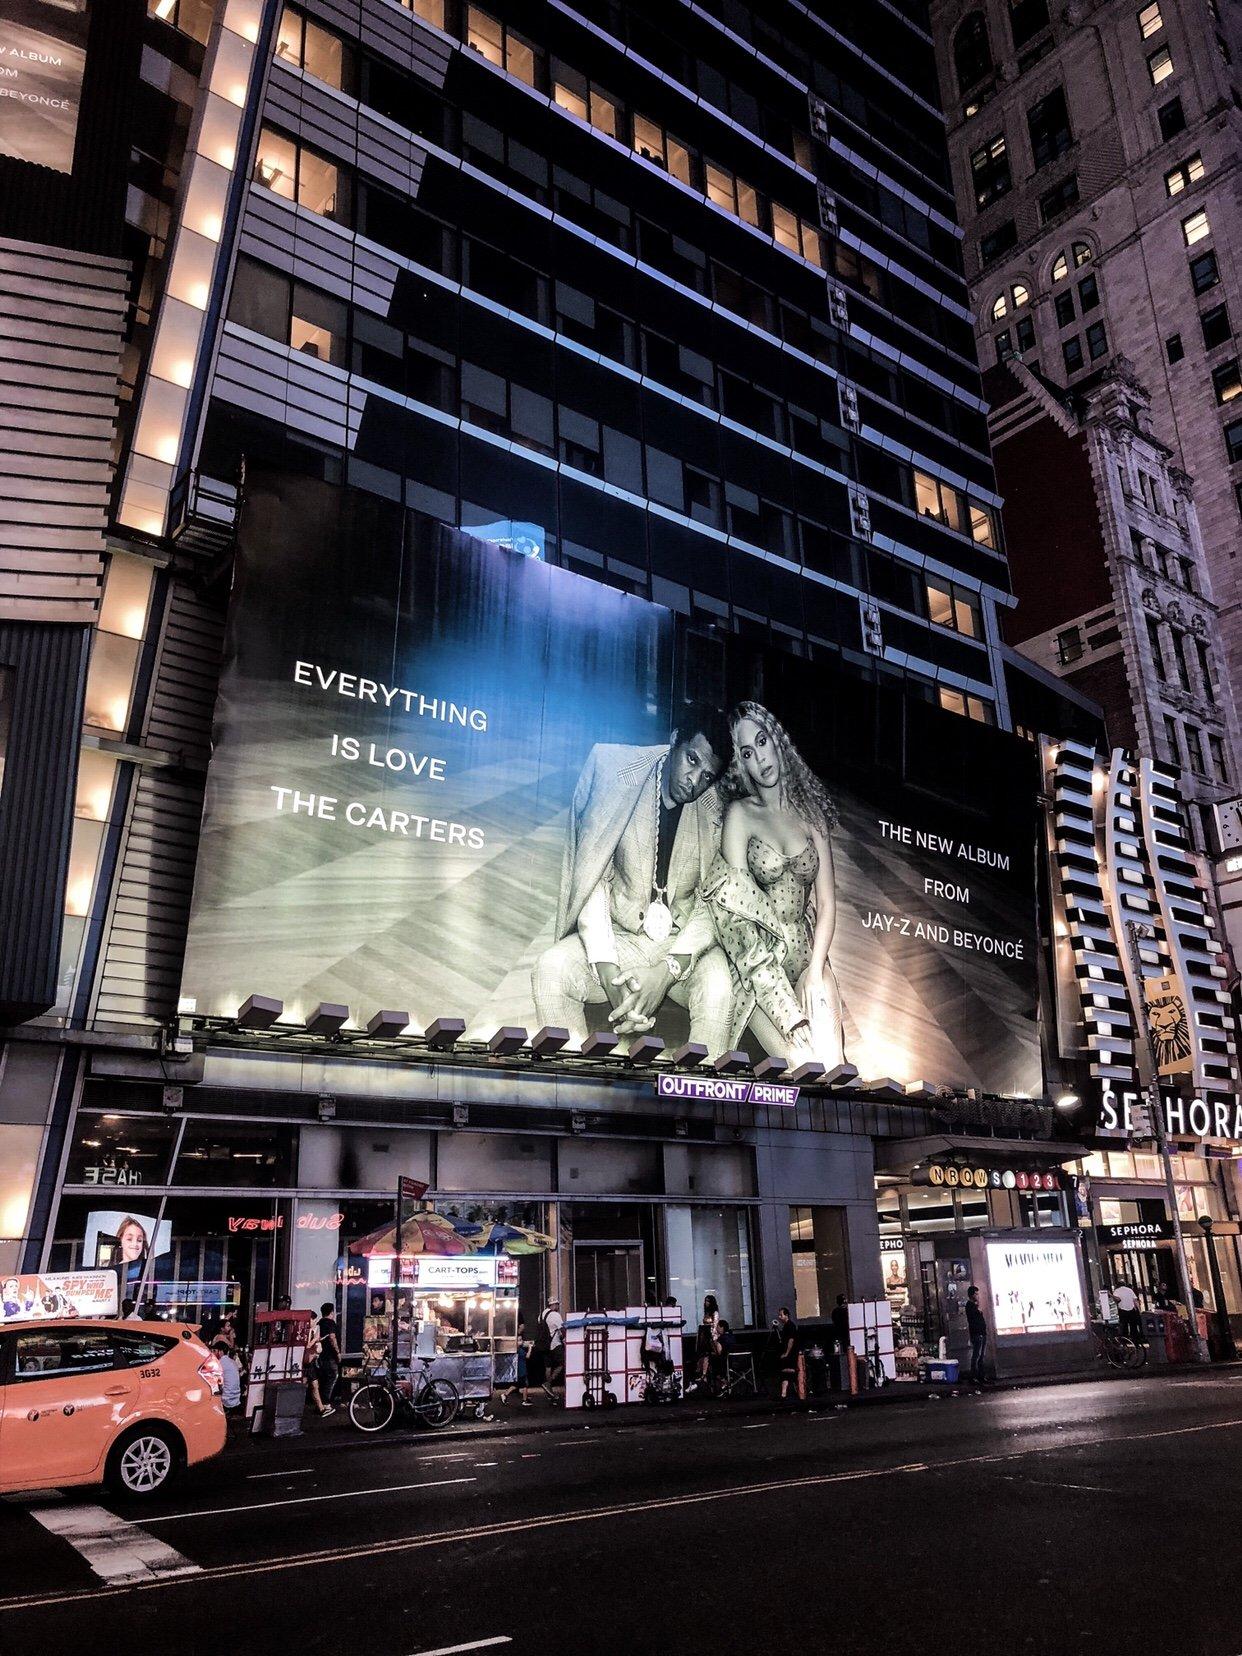 4 Tage in New York City -Time Square - Nowshine Reiseblog ü 40